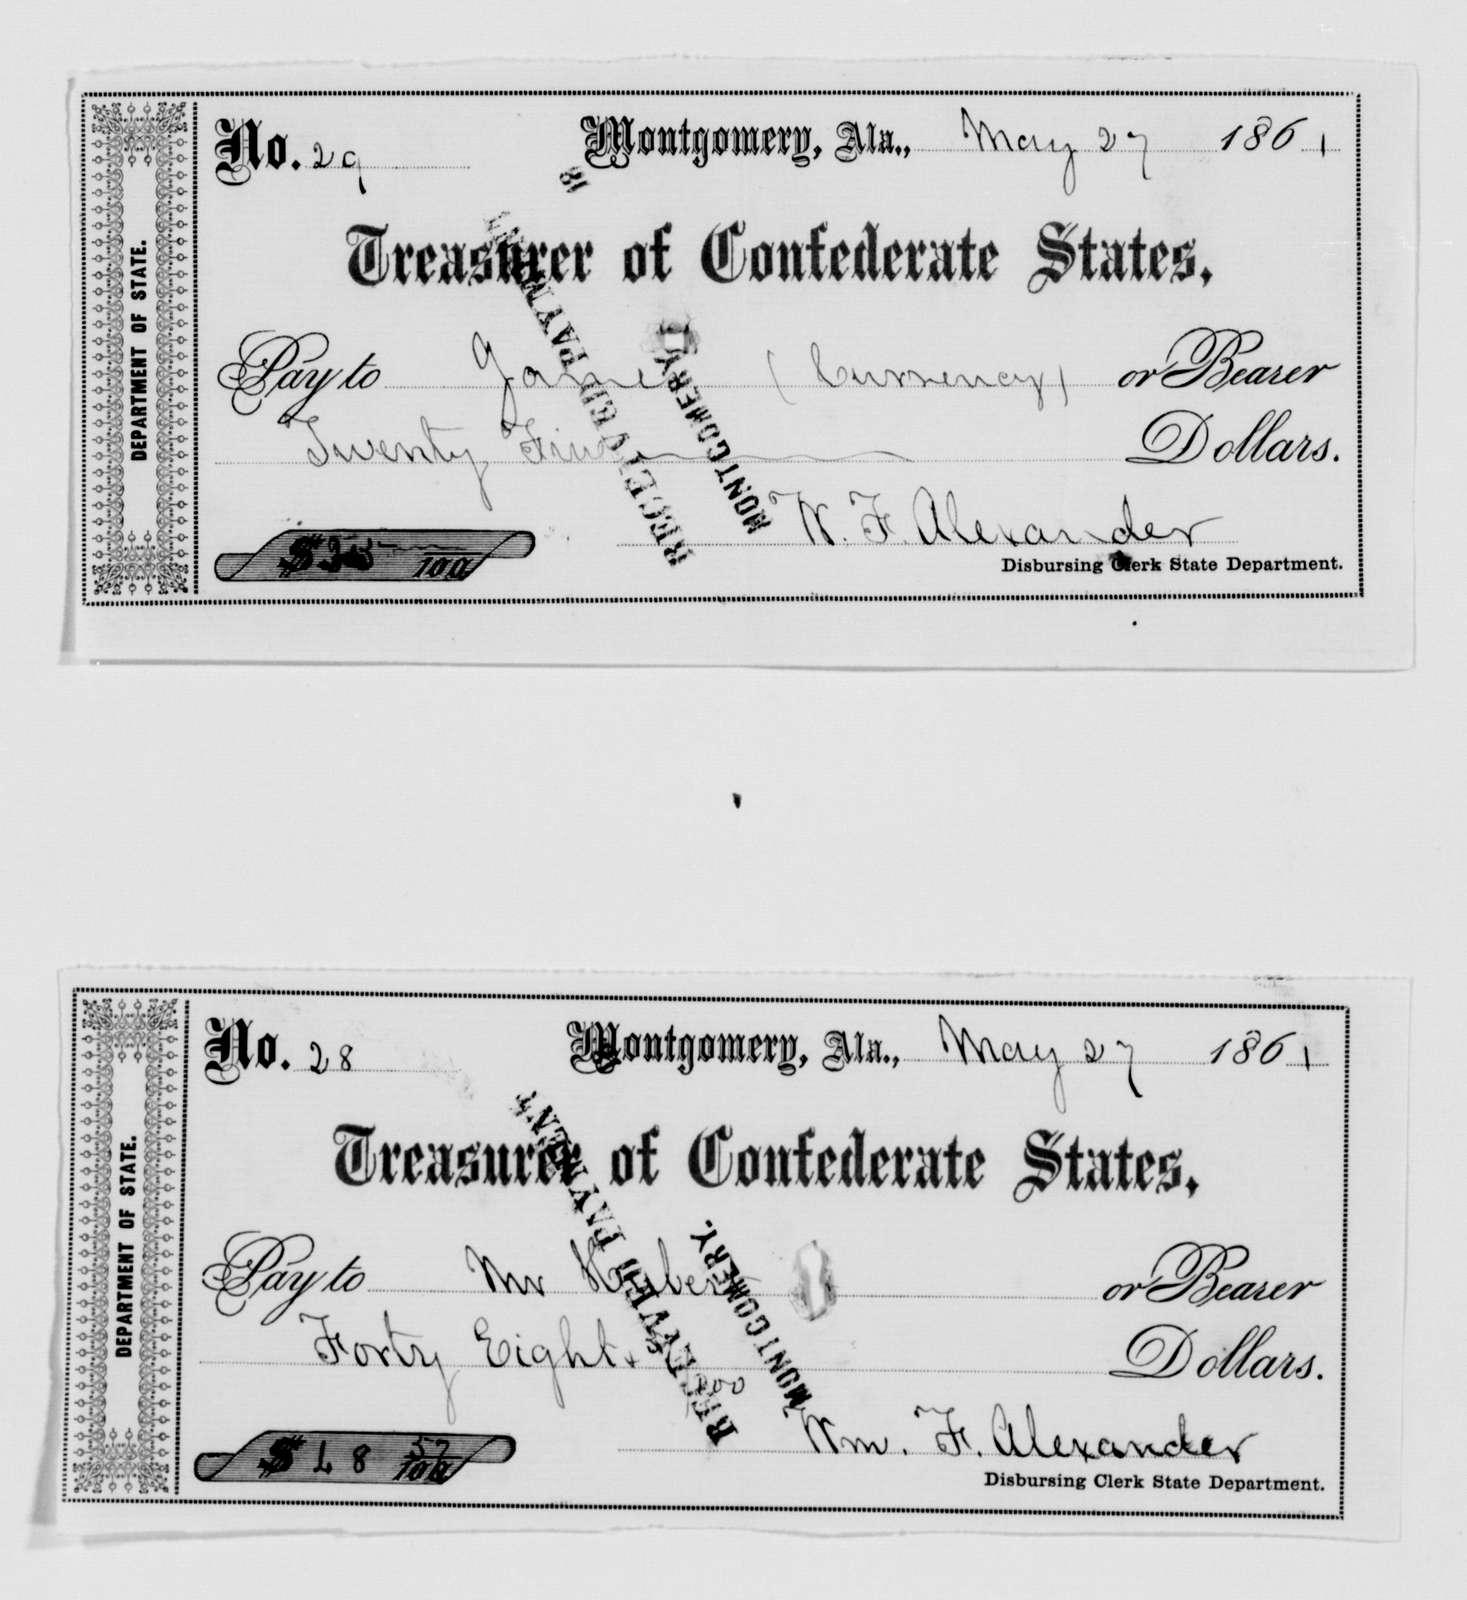 Confederate States of America records: Microfilm Reel 18